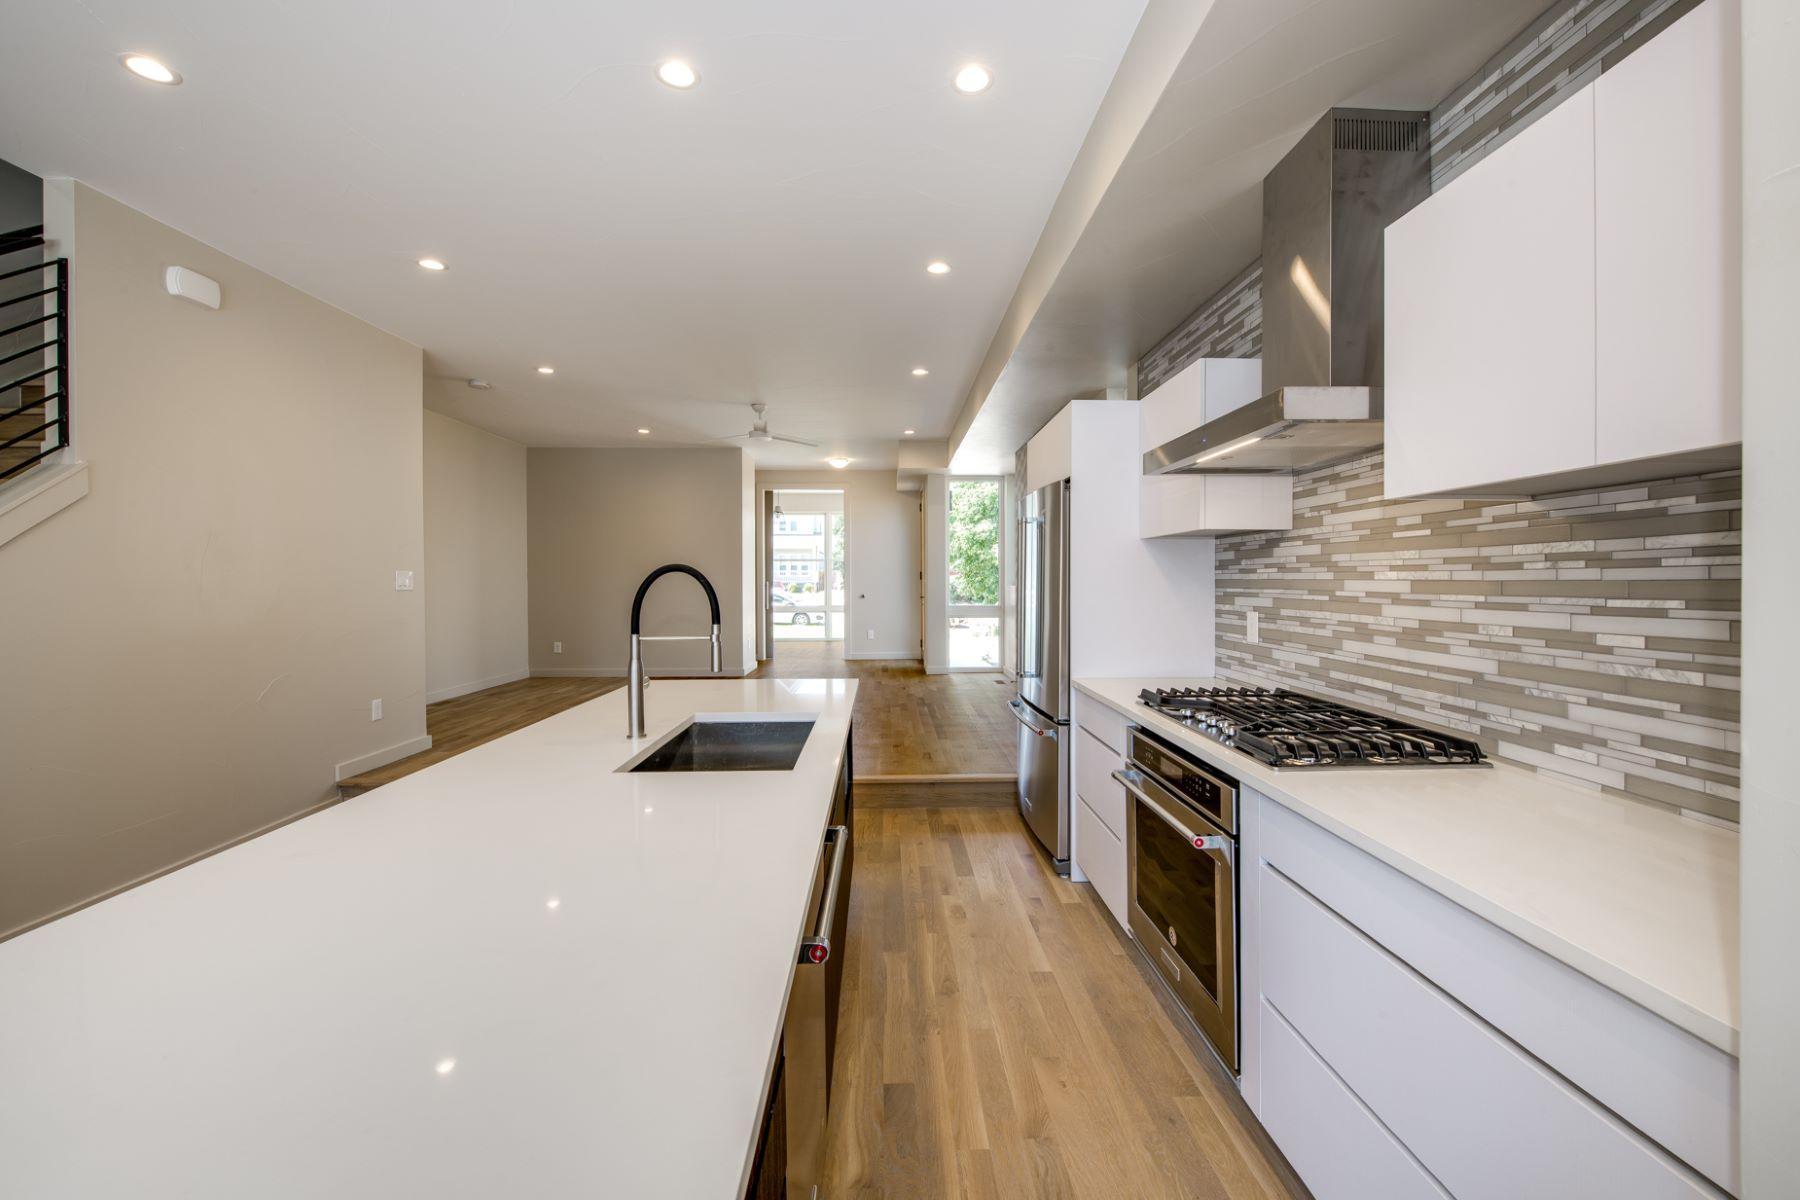 Additional photo for property listing at 4250 Osage St 4250 Osage St Denver, Colorado 80211 United States